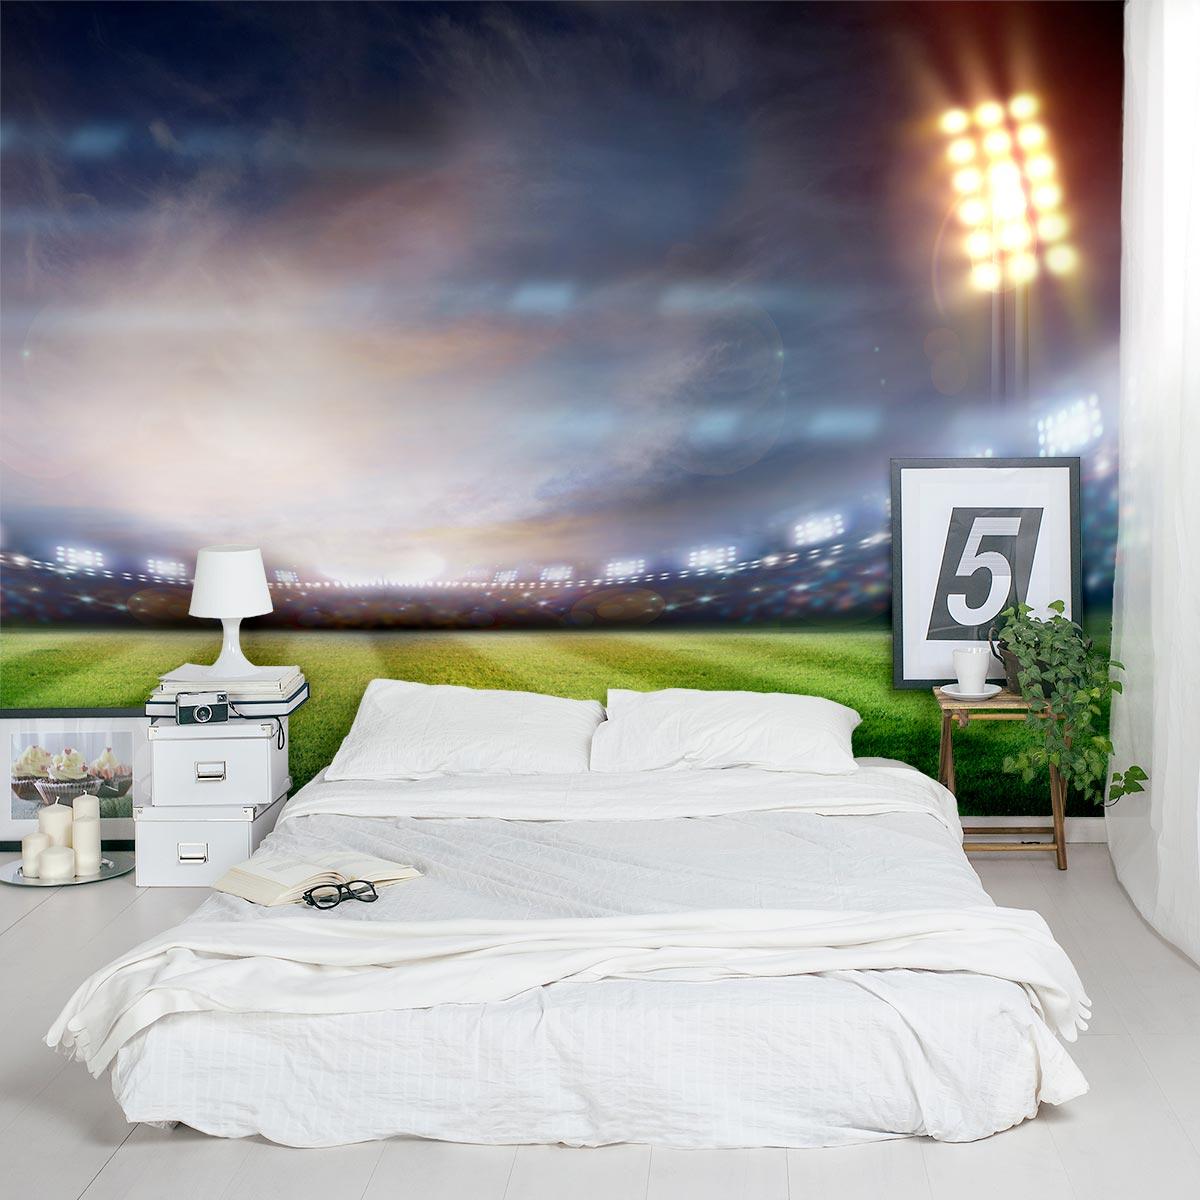 Stadium lights wall mural best free home design idea for Mural lighting